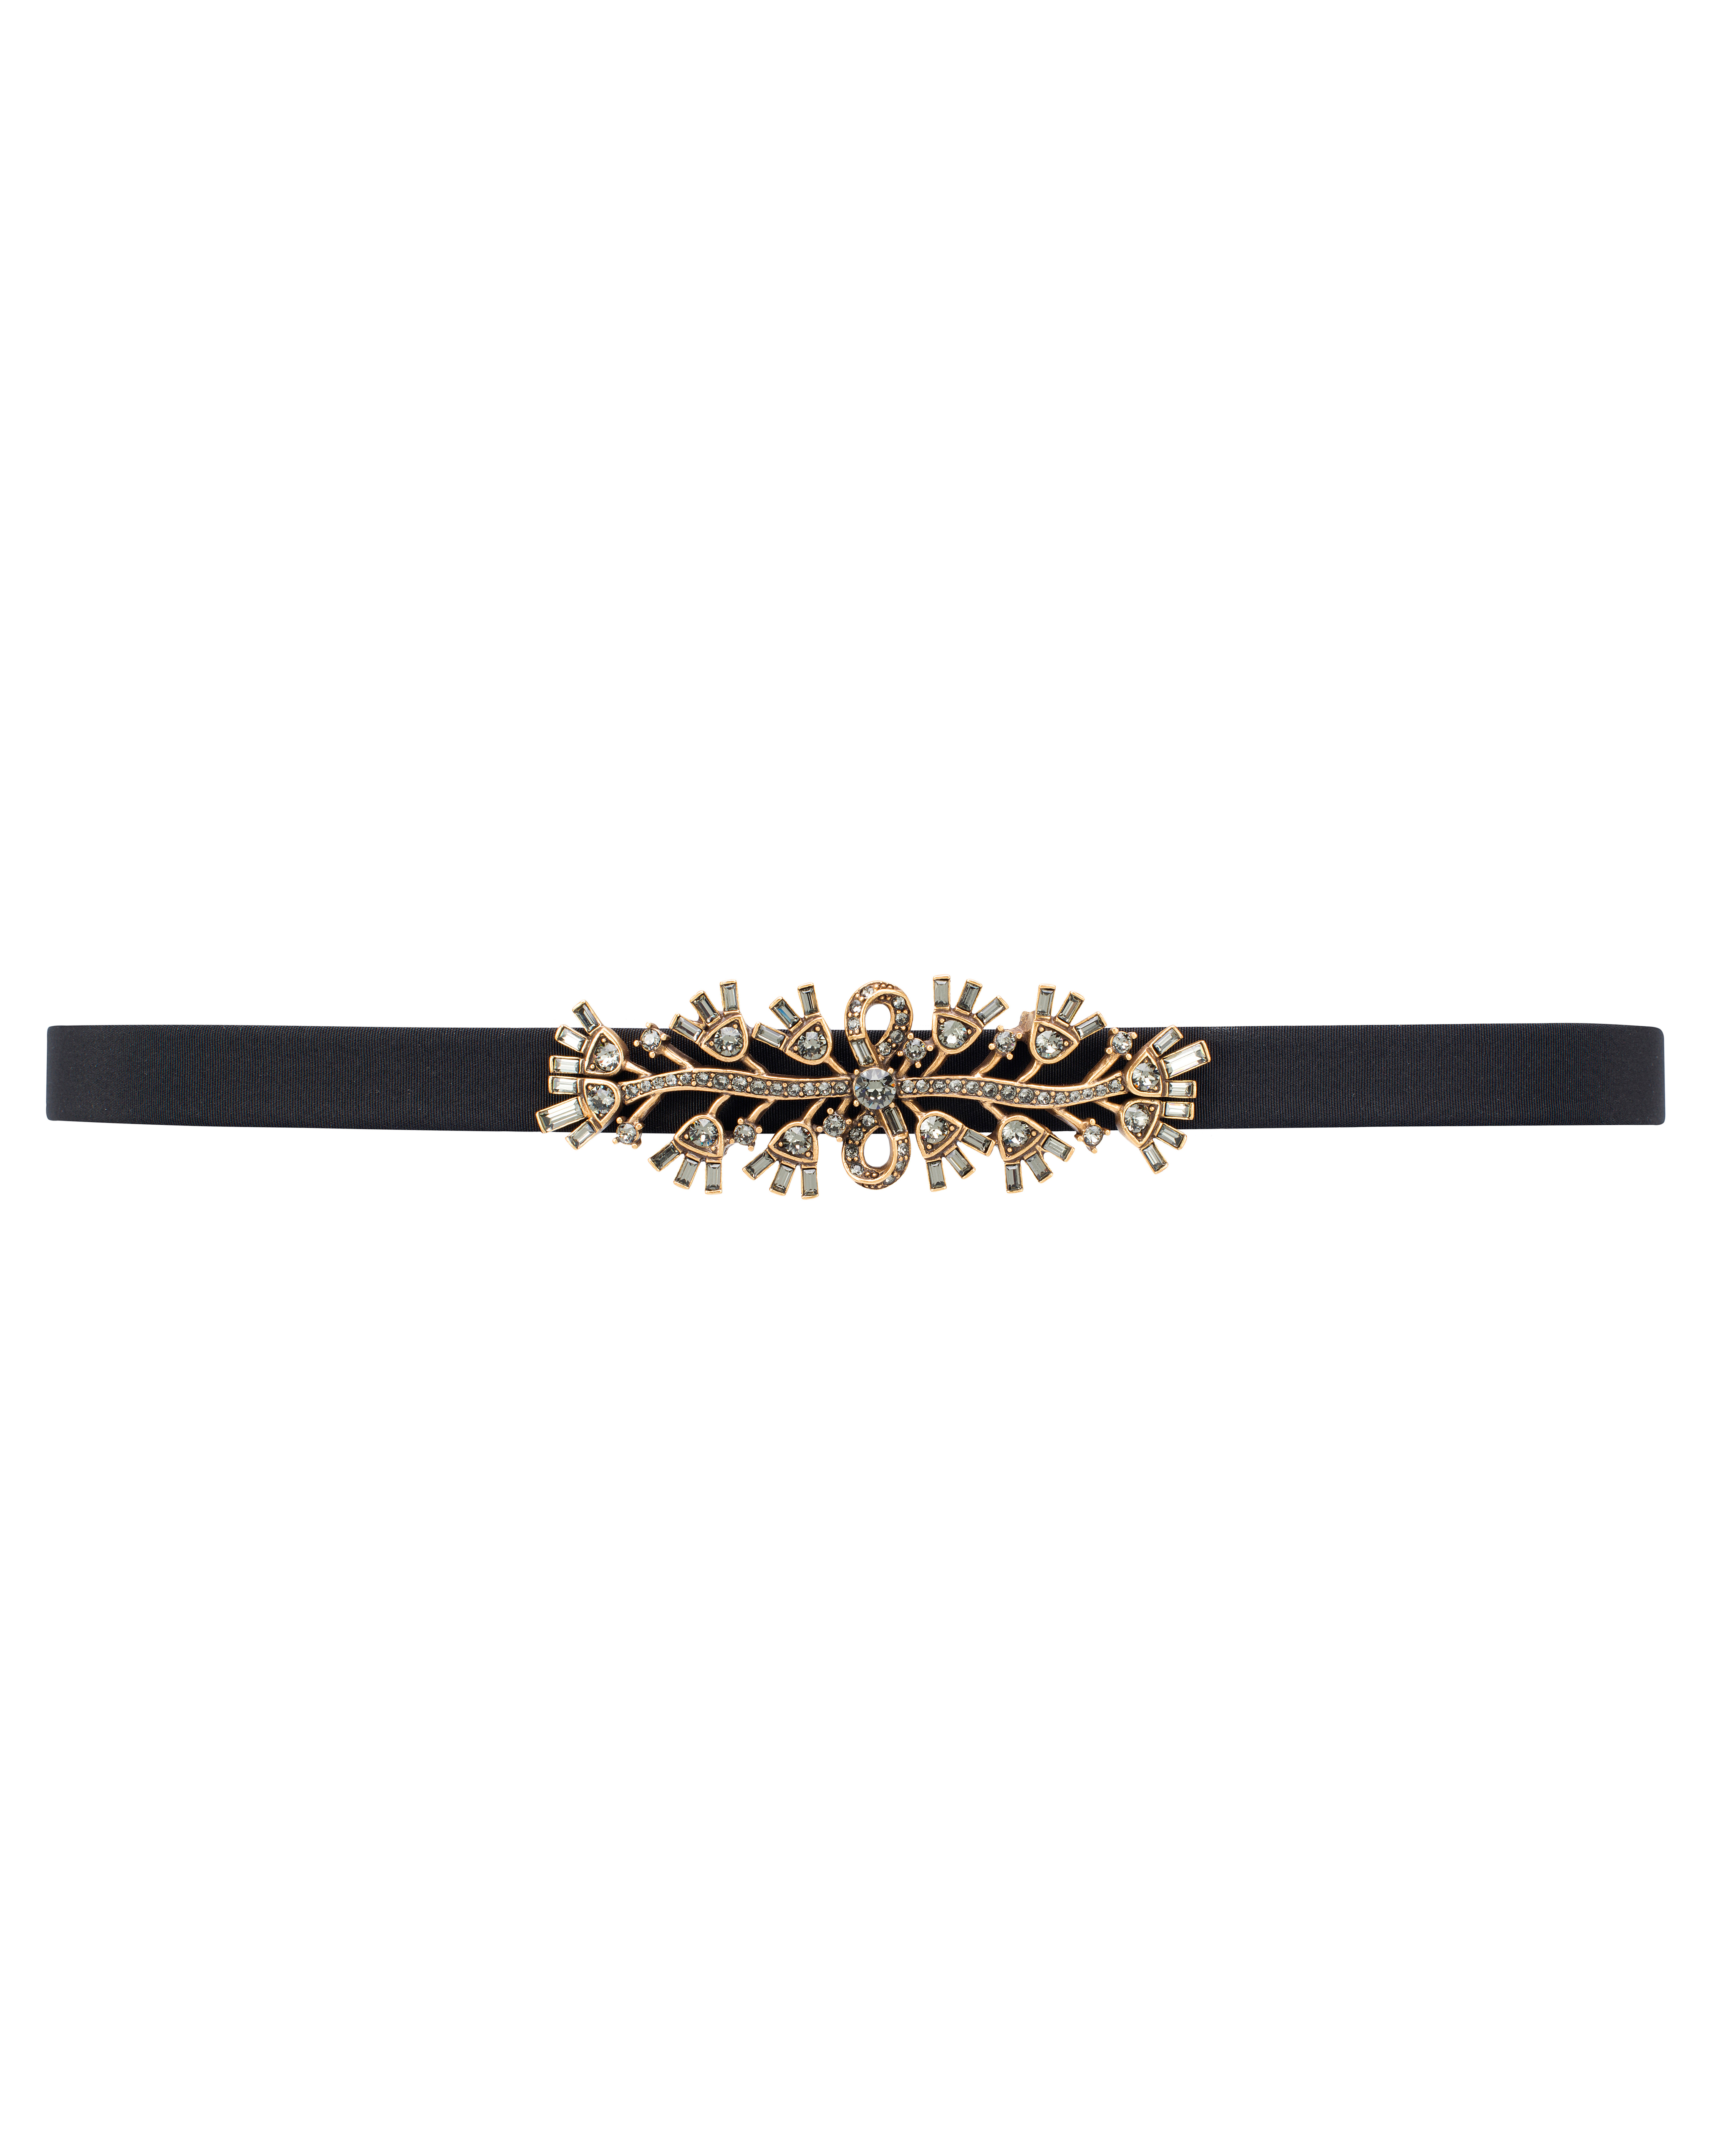 sparkly-accessories-odlr-1215.jpg